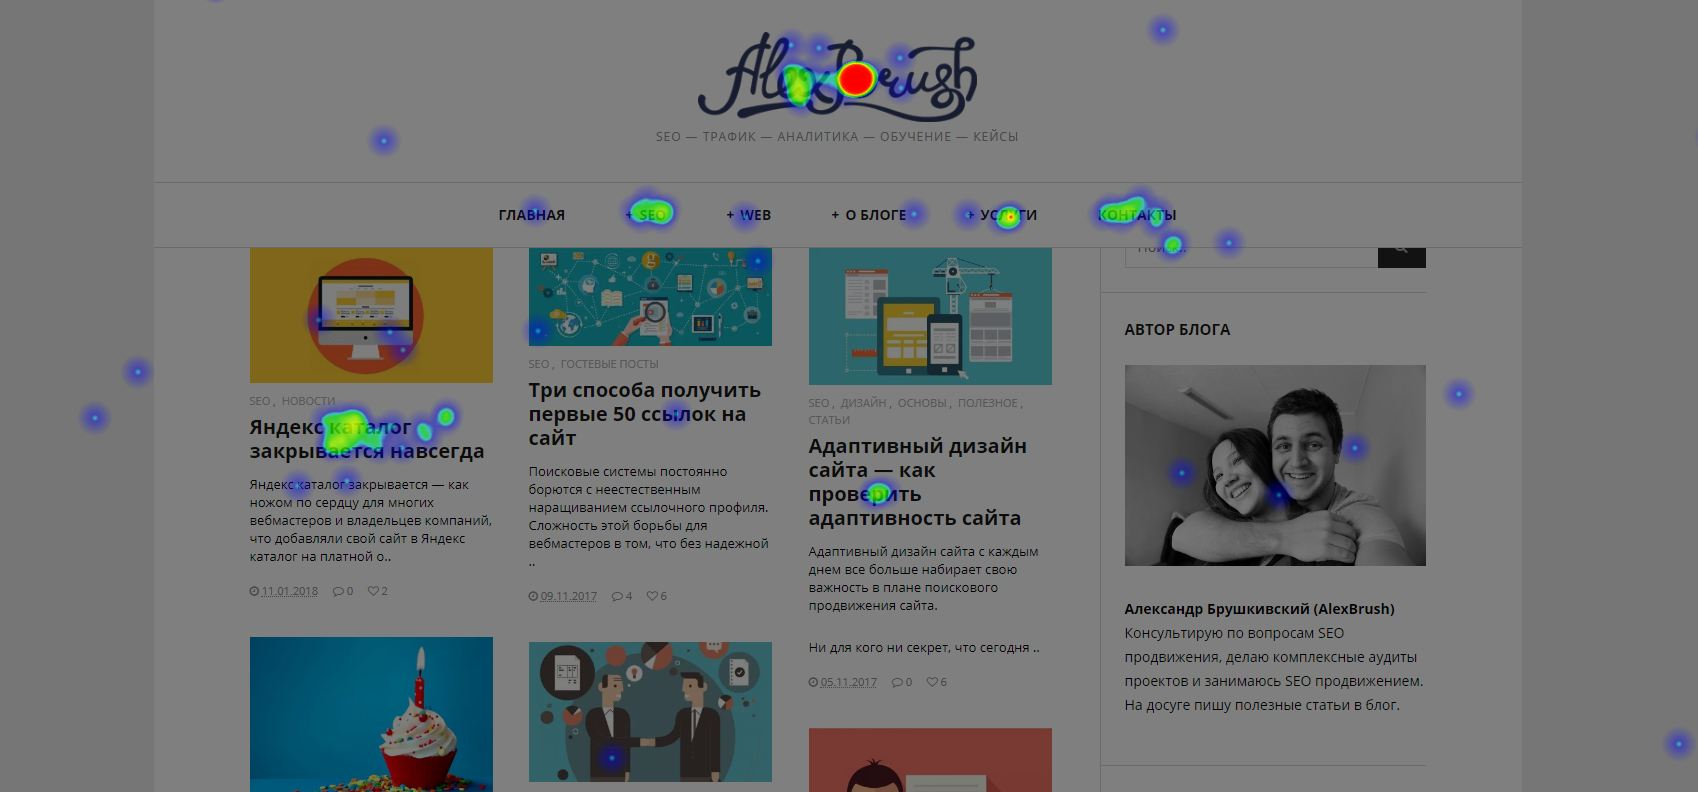 Карты в Яндекс метрика - клики, ссылки, скроллинг